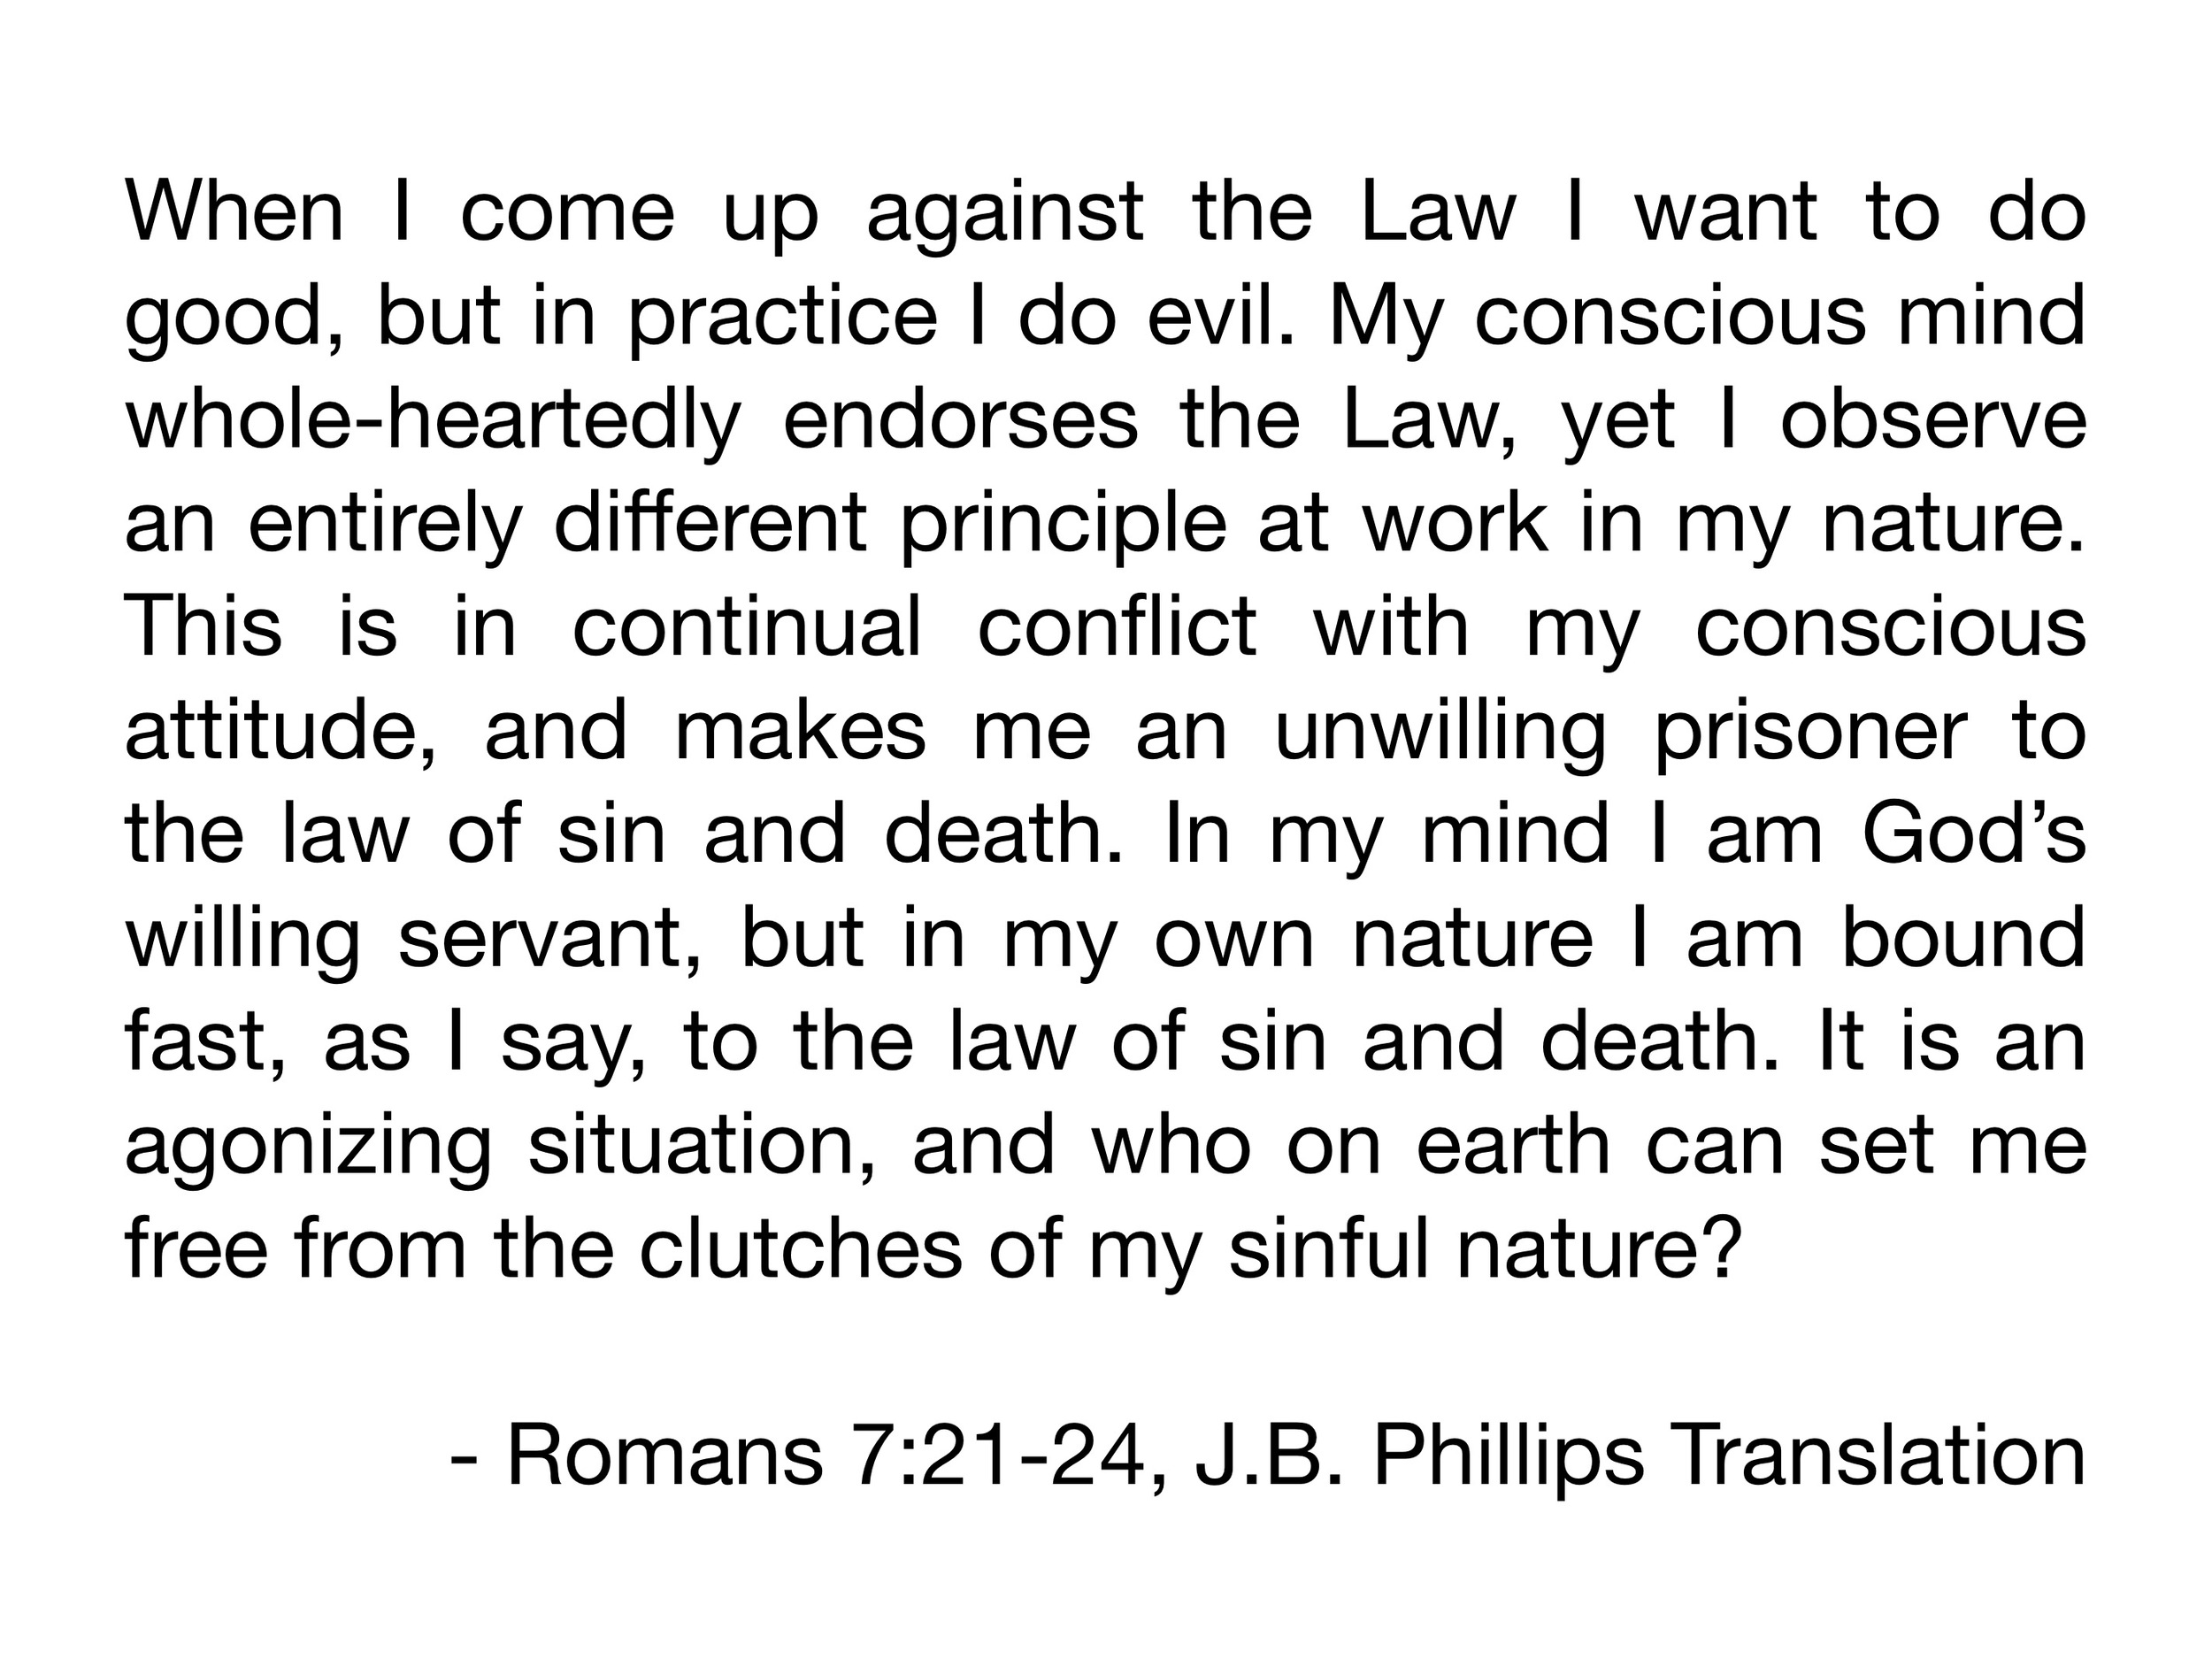 Romans 7:15-25 Sildes-1 29-29.jpeg